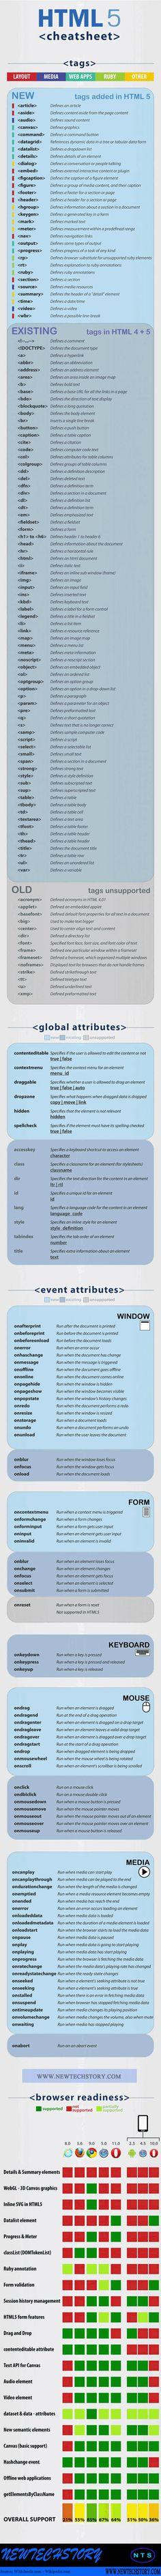 A Closer Look at HTML5 Cheatsheet [InfoGraphics]